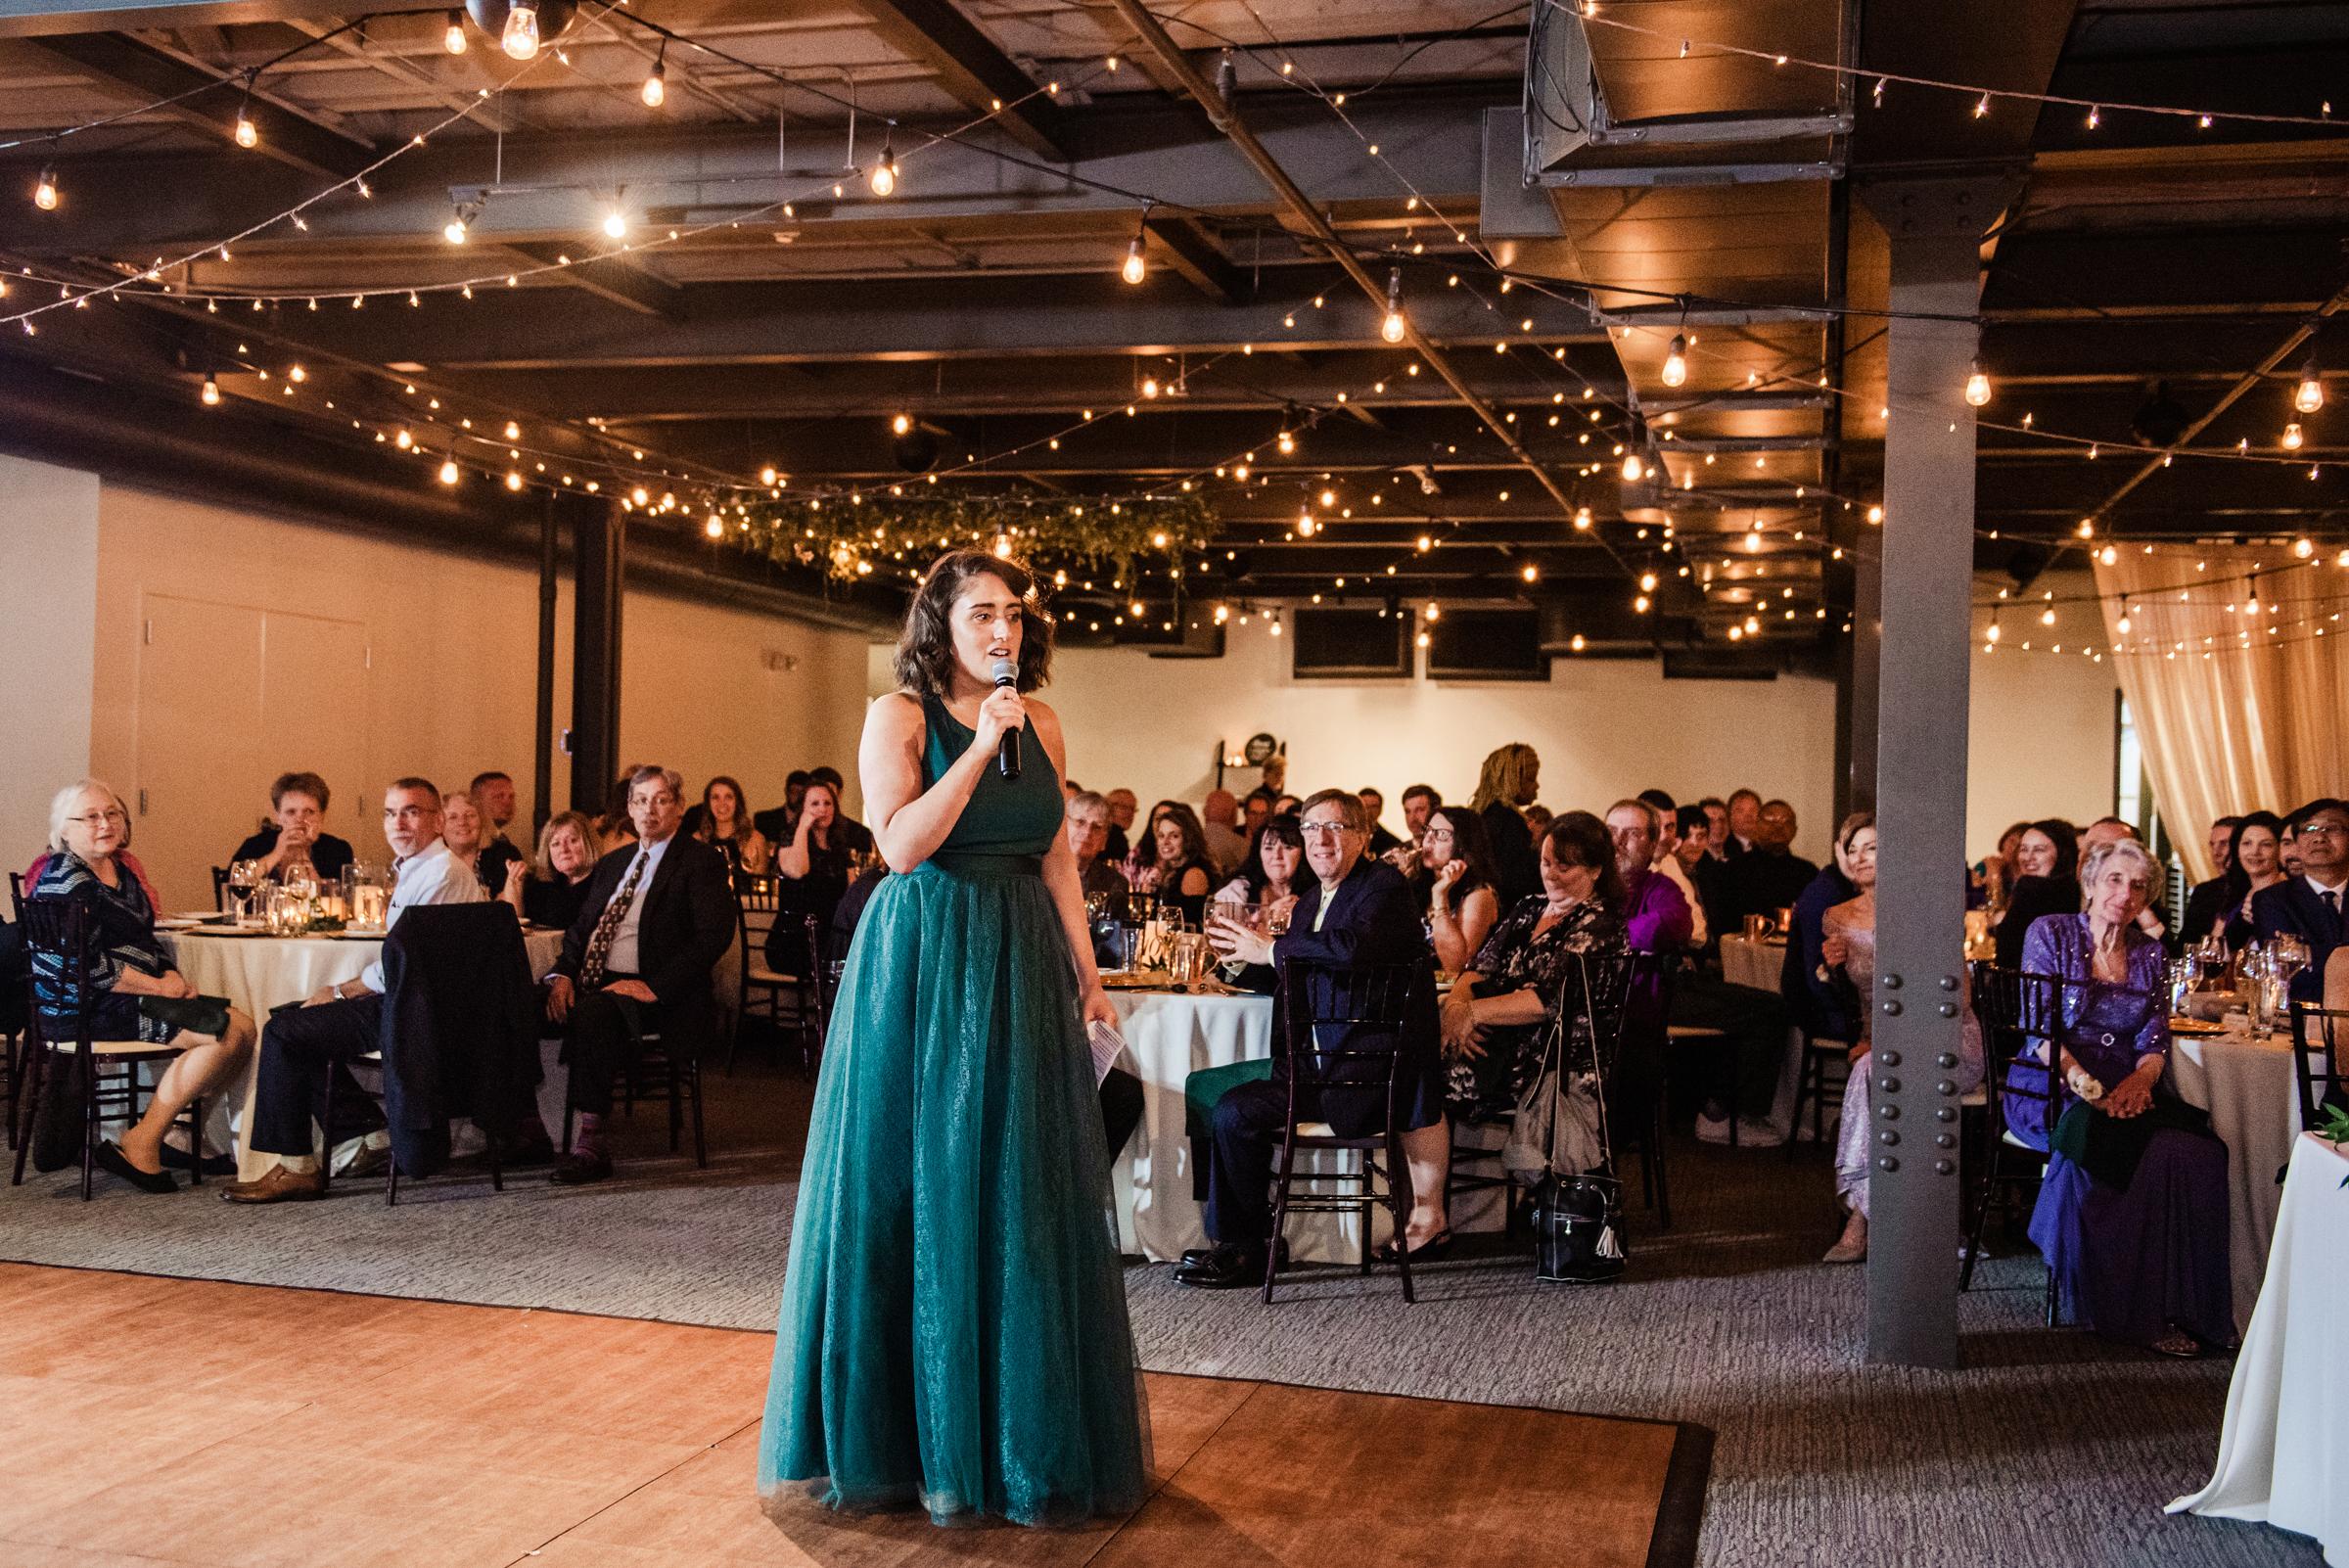 SKY_Armory_Syracuse_Wedding_JILL_STUDIO_Rochester_NY_Photographer_DSC_6189.jpg